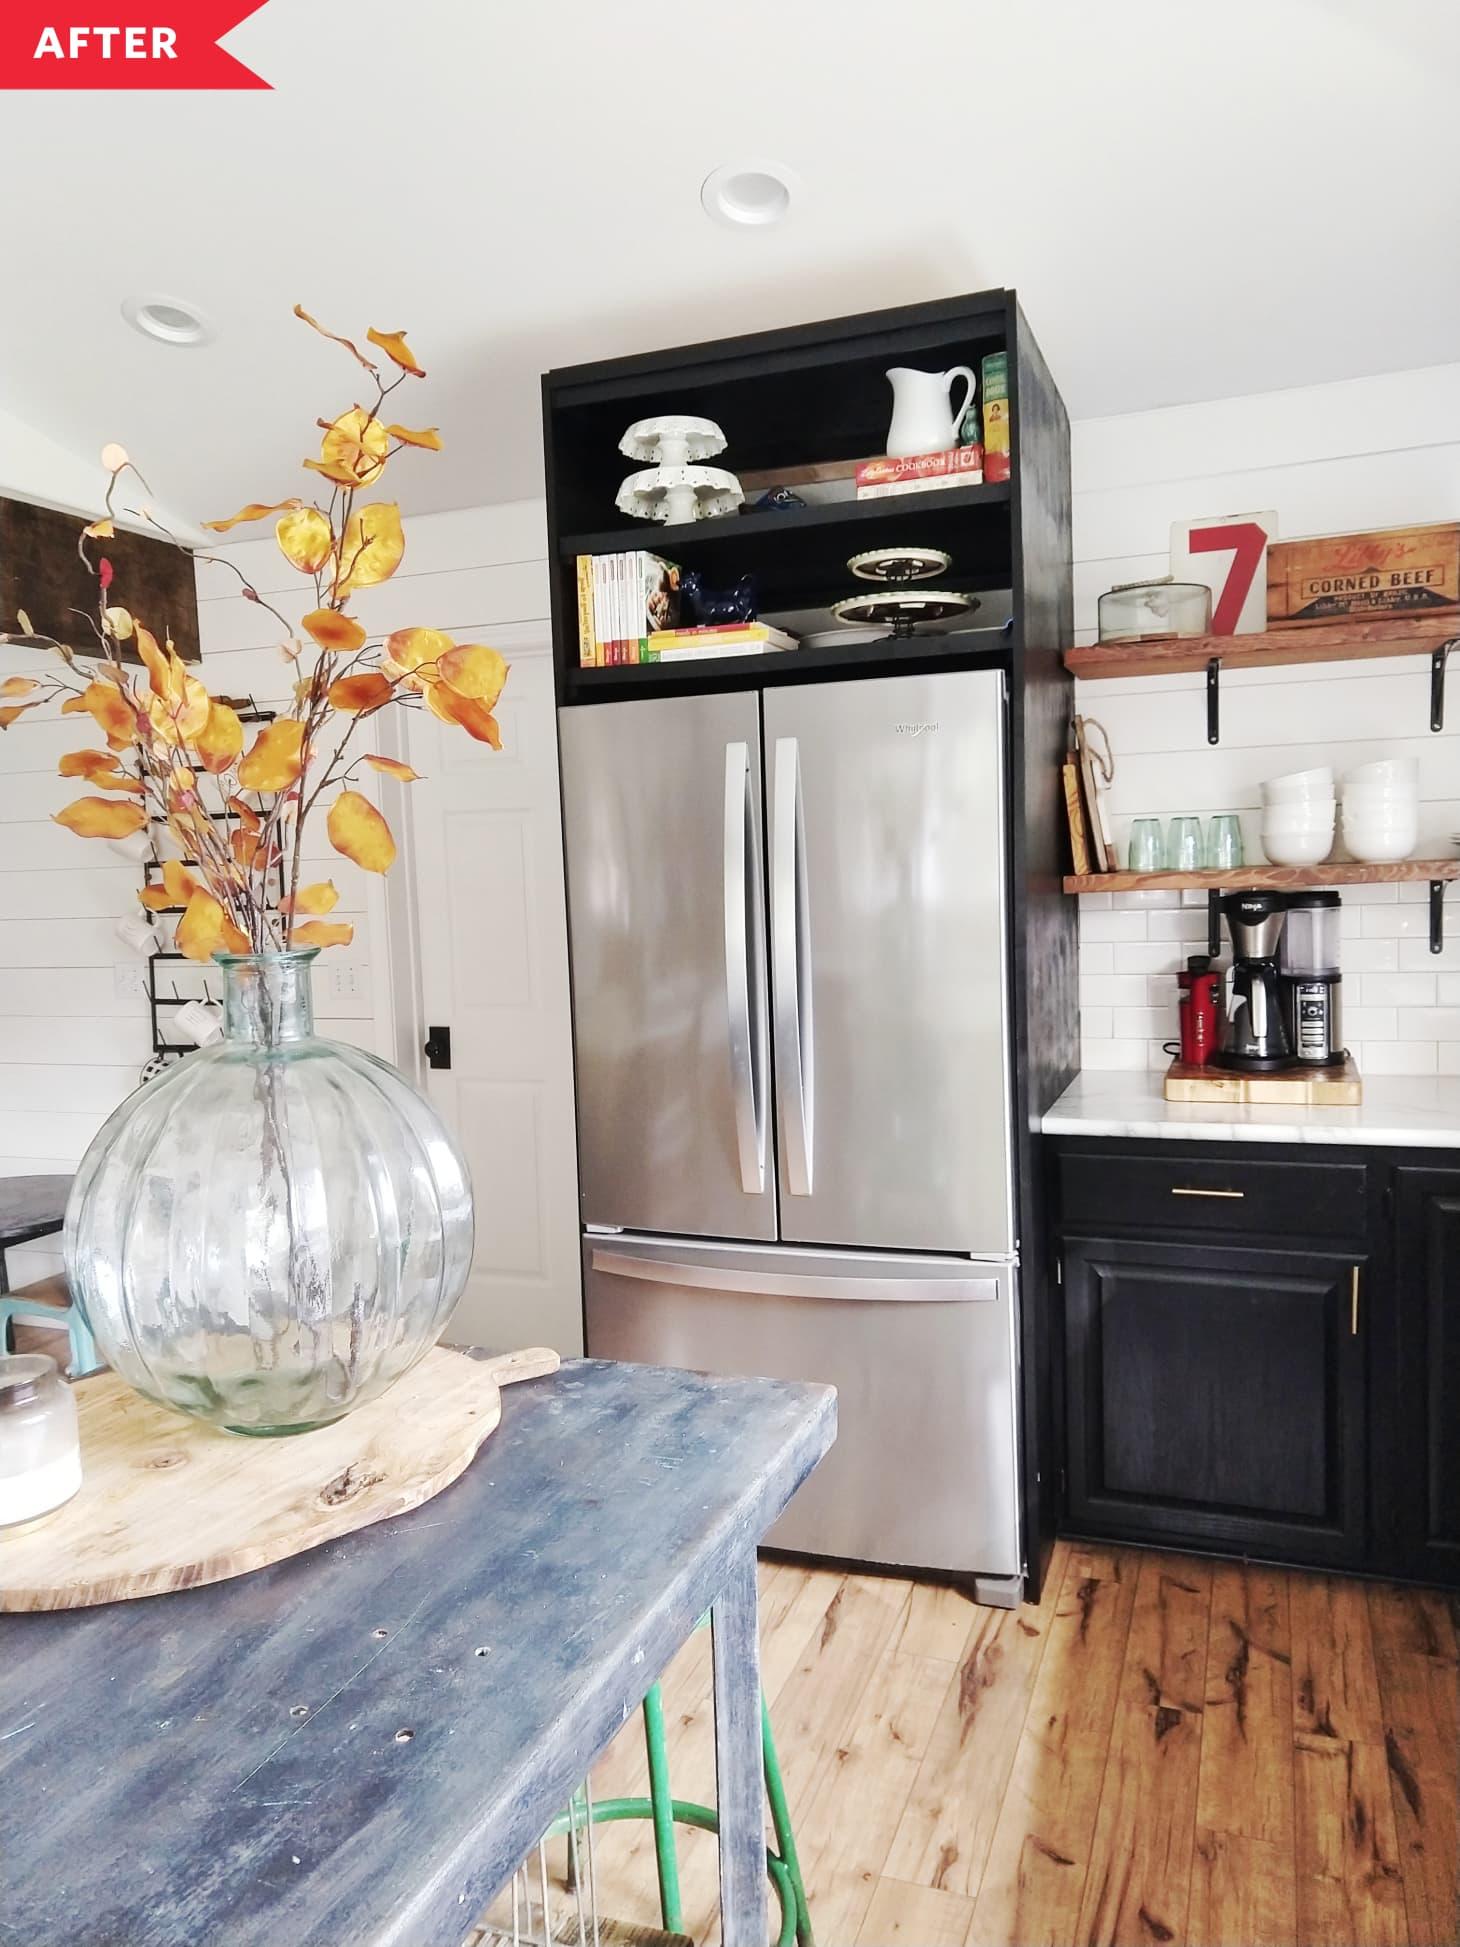 Fridge Surround - Kitchen Cabinet Ideas | Apartment Therapy